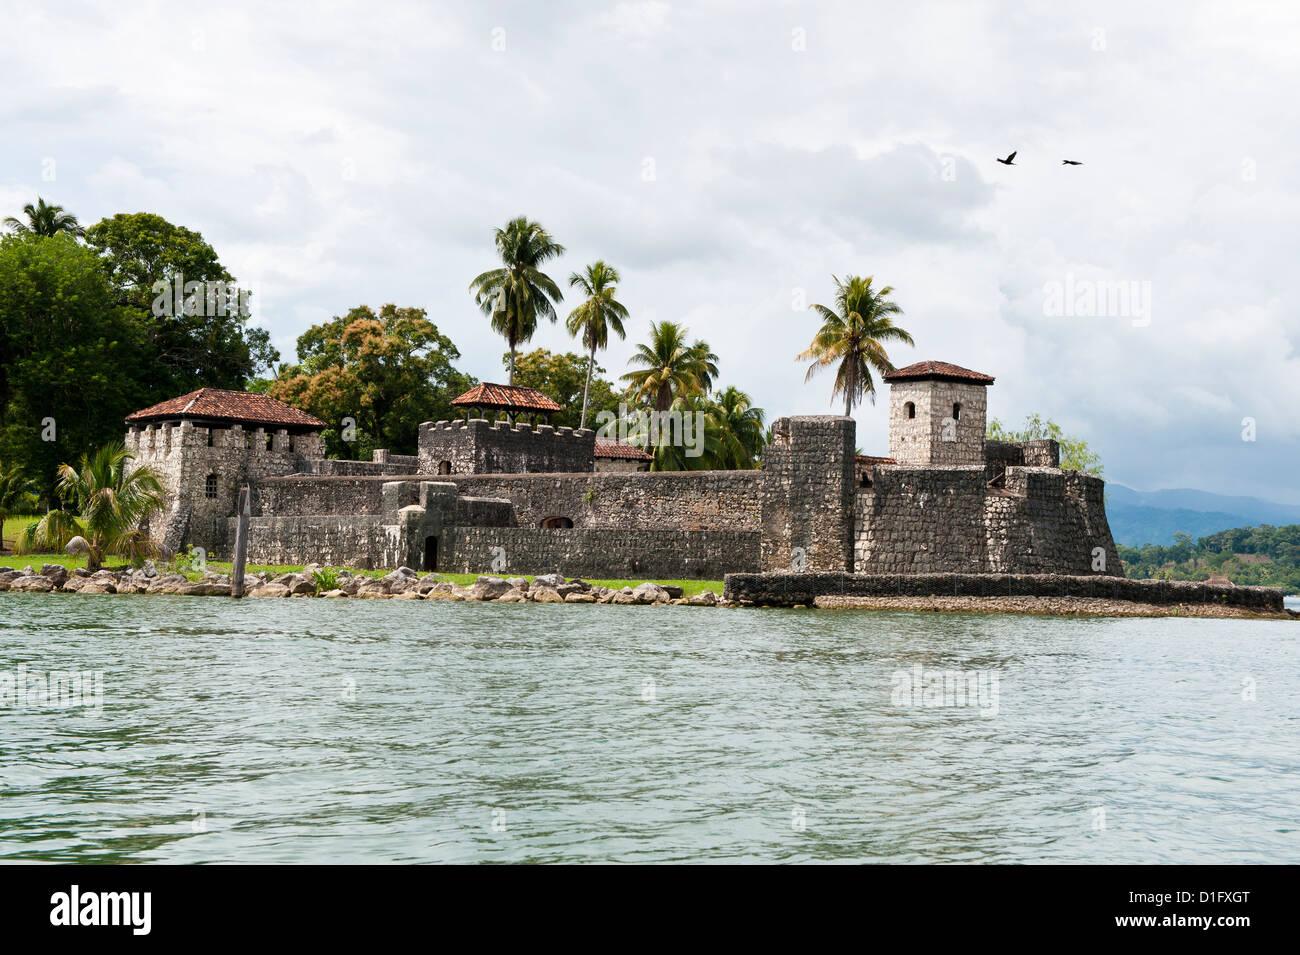 Castillo de San Felipe, el lago de Izabal (Lago de Izabal, Guatemala, América Central Imagen De Stock